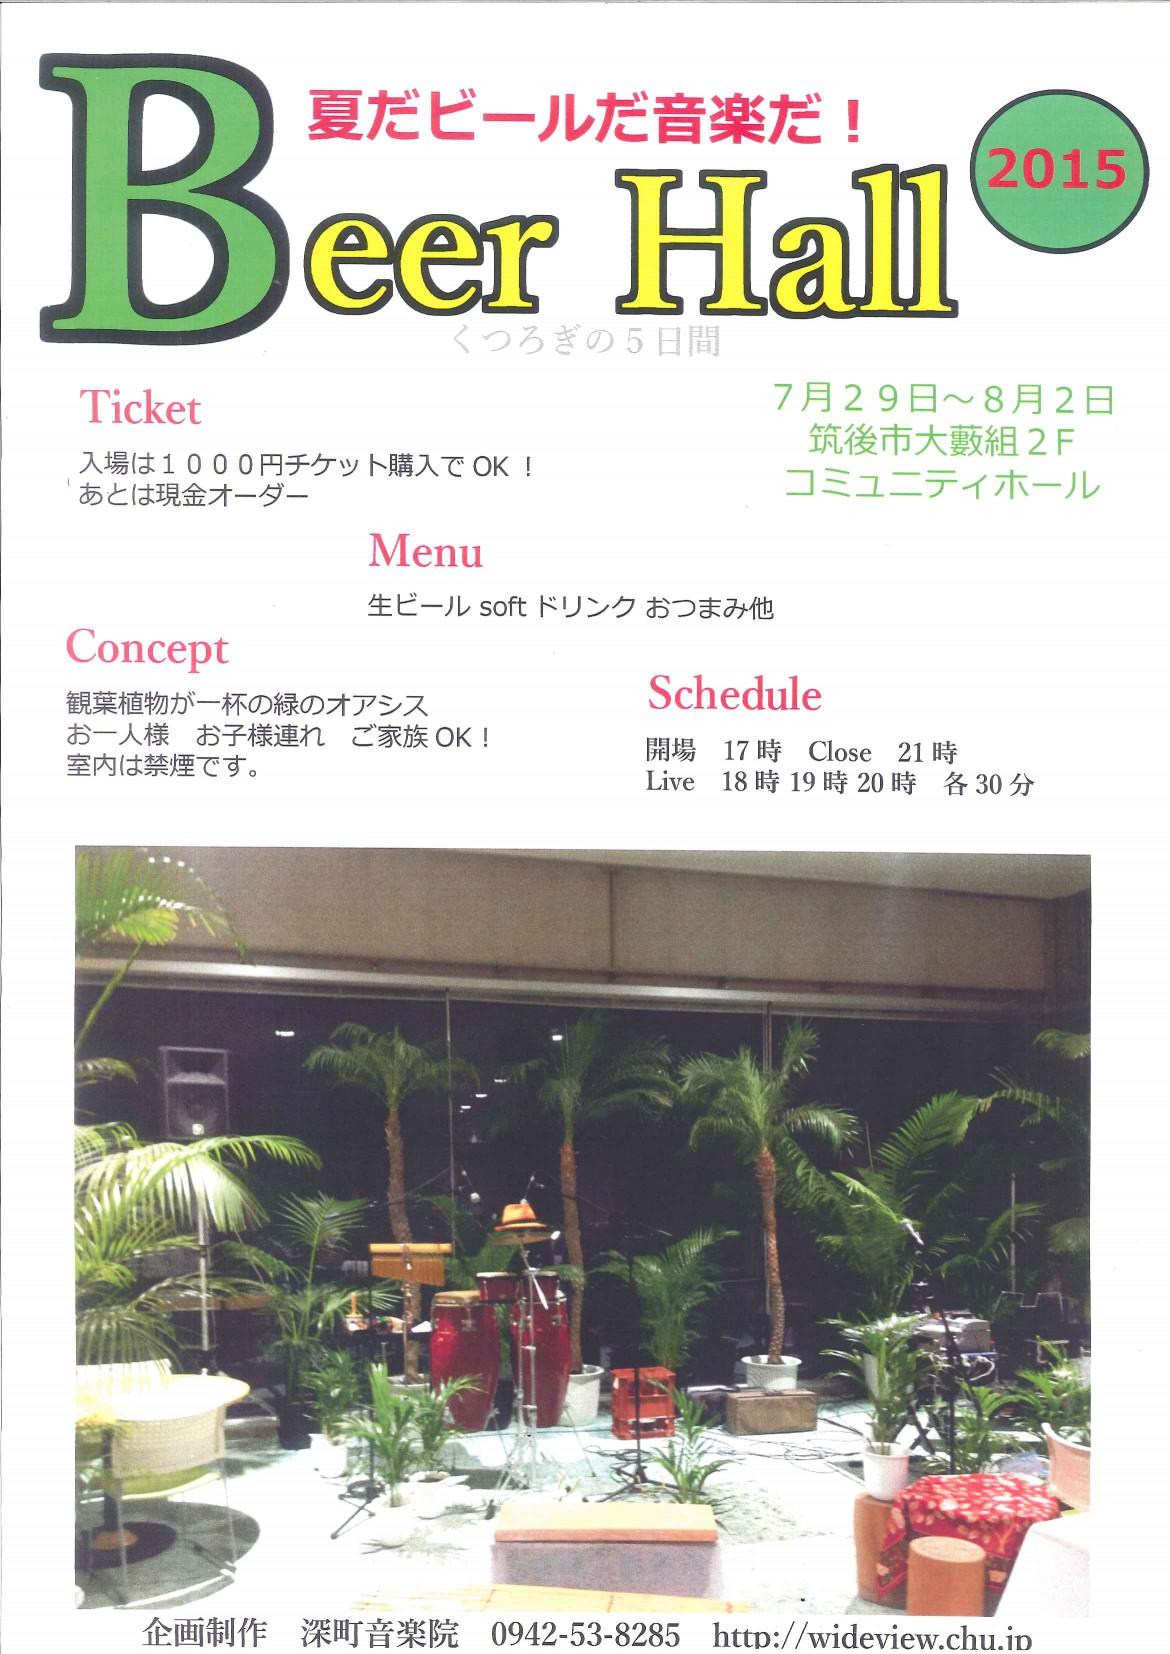 Beer Hall 2015